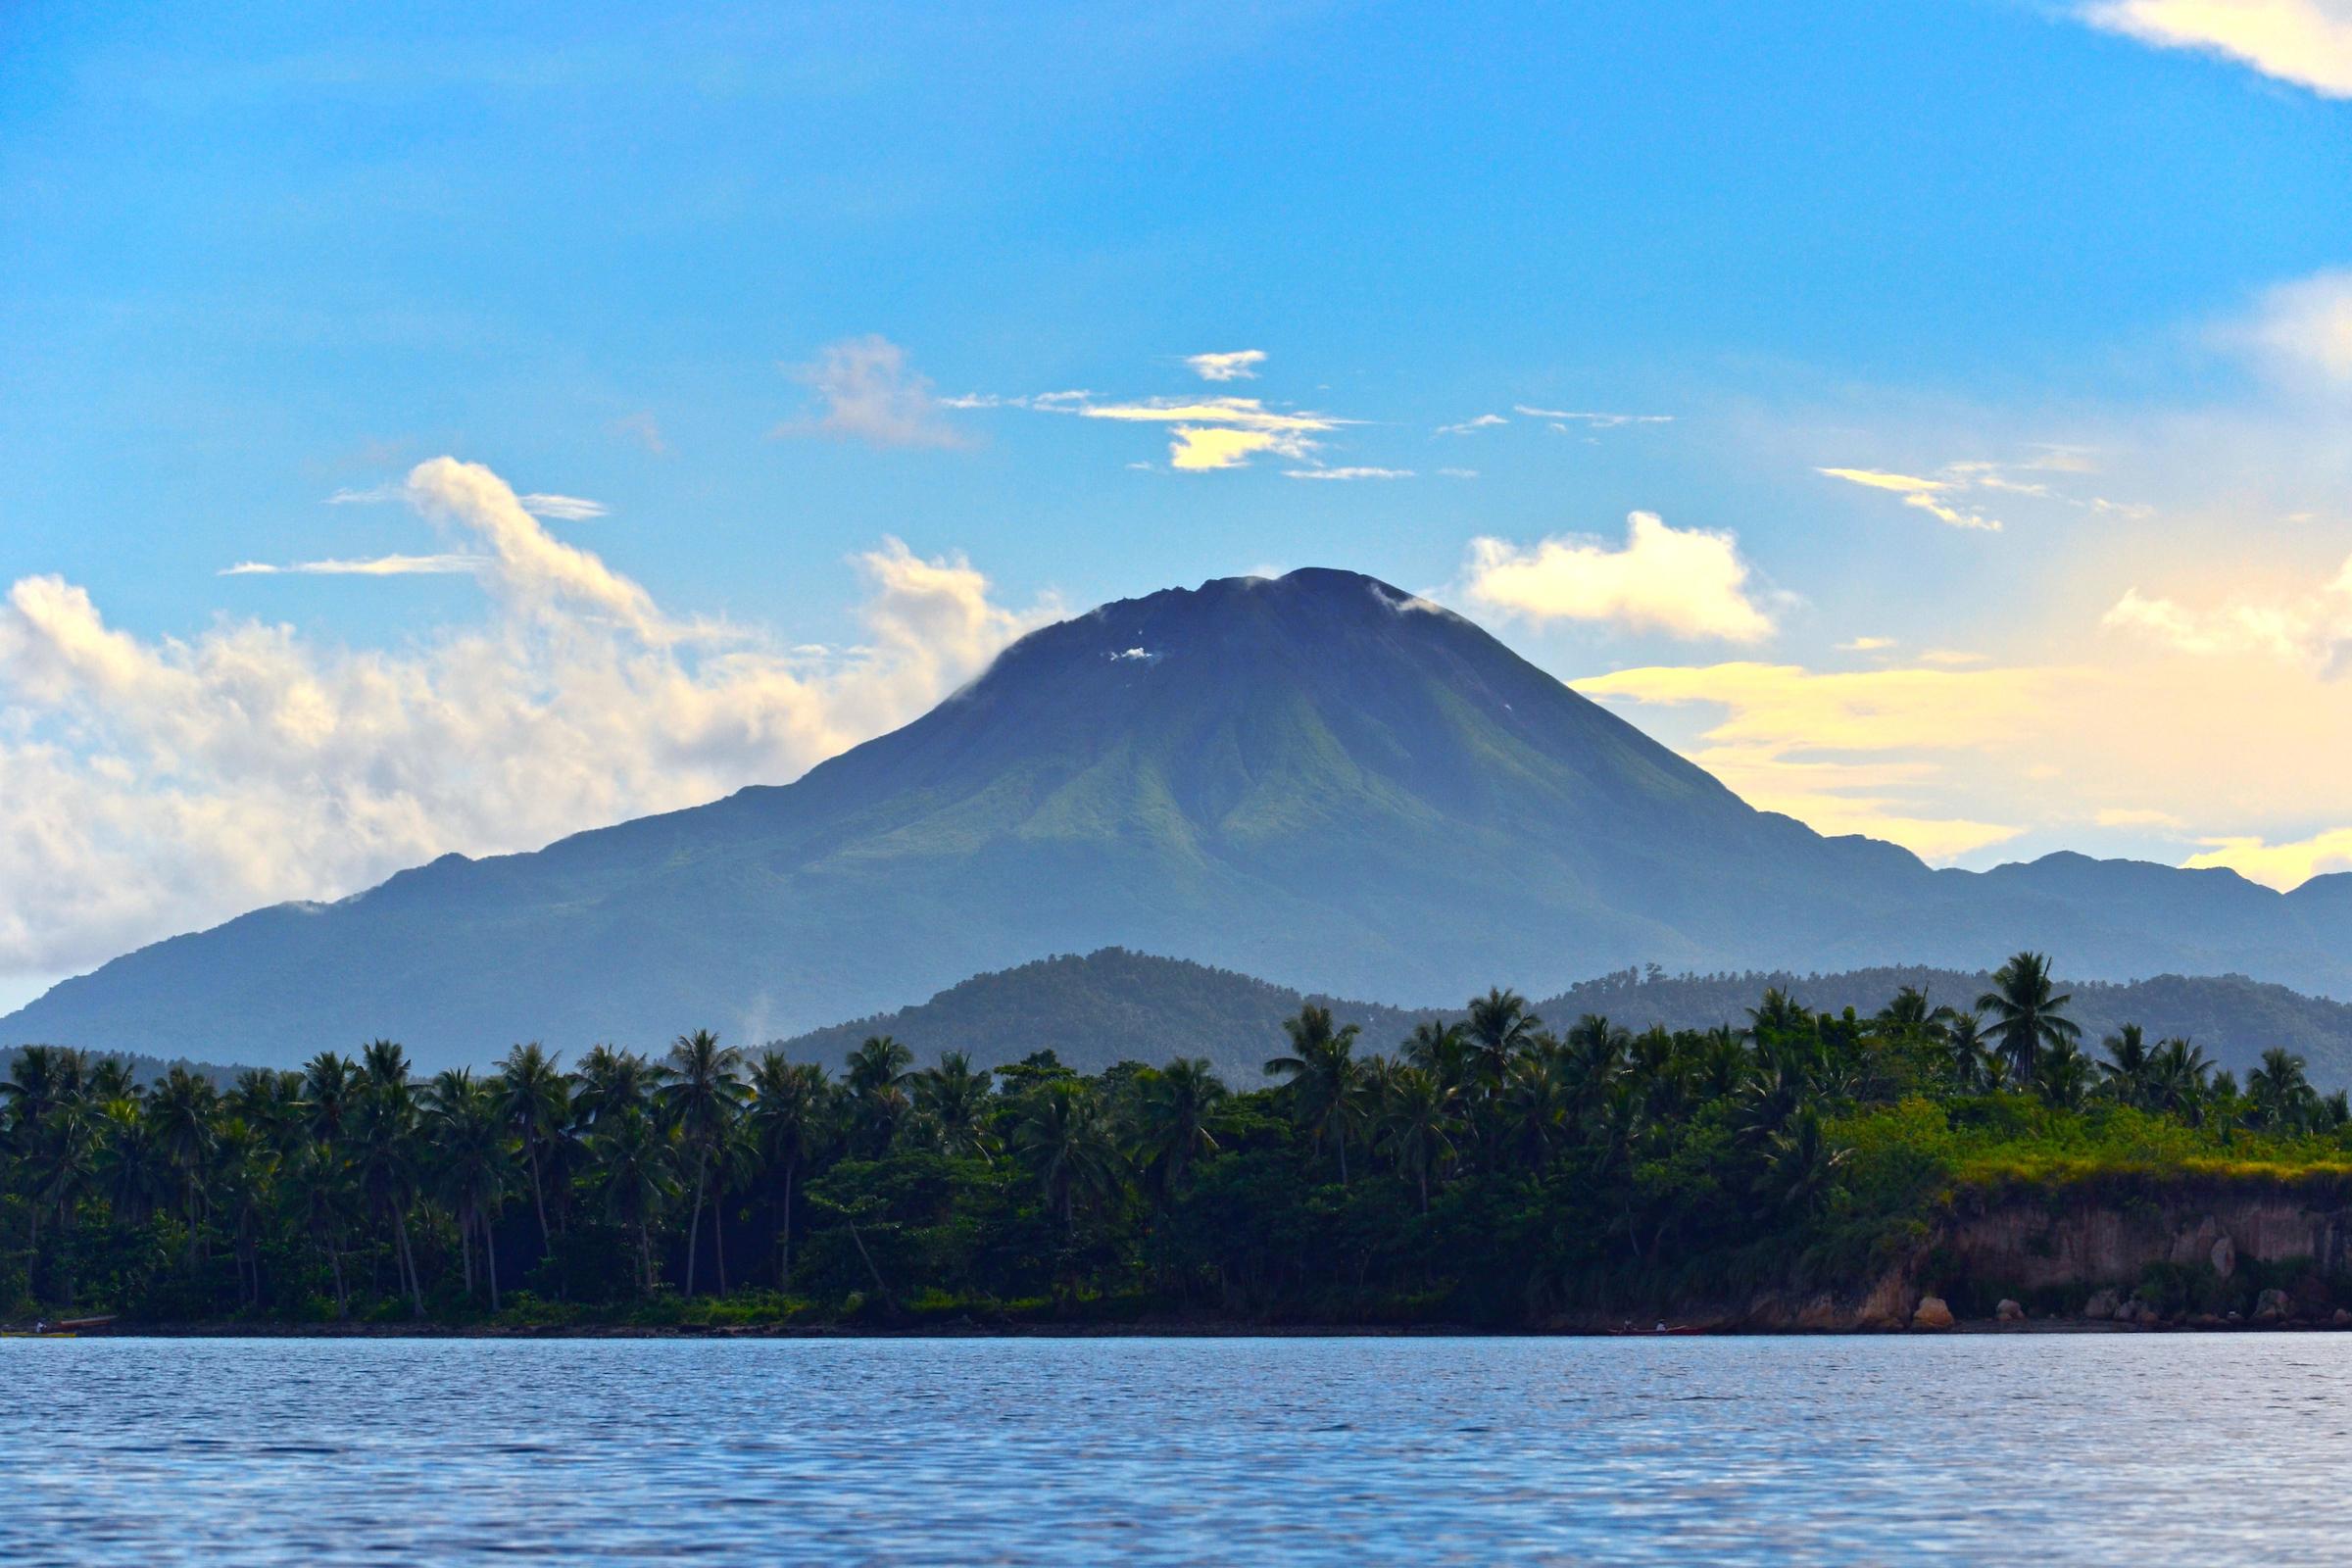 Scenic view of Mount Bulusan